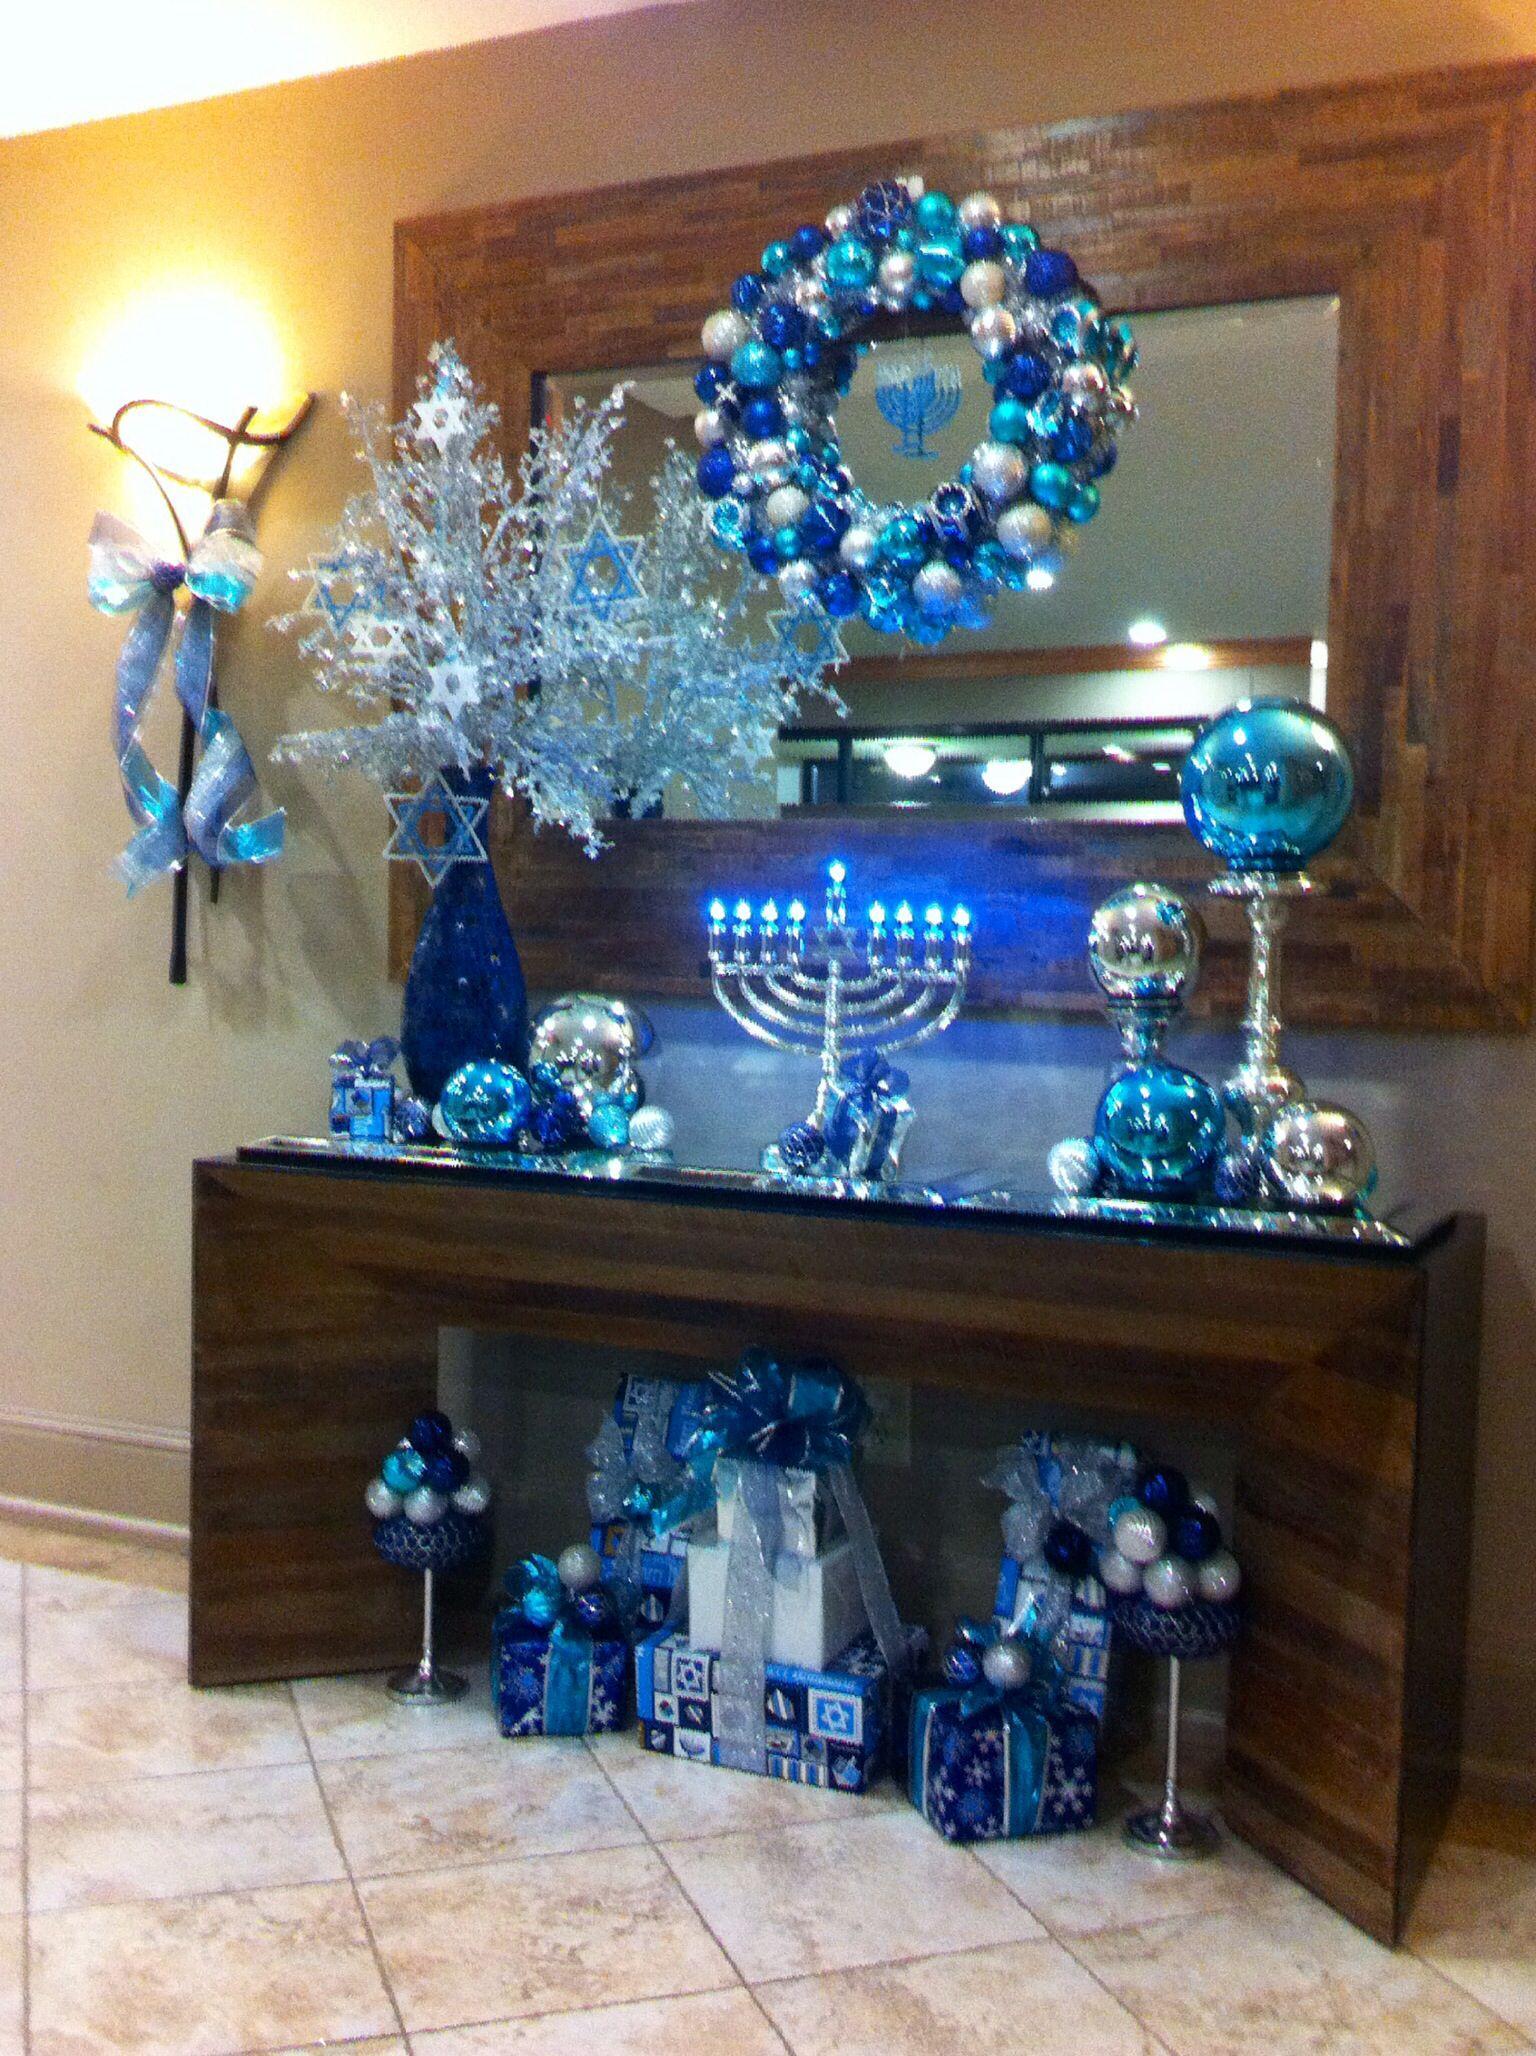 Hanukkah Decorations Really Like The Giant Glass Ball On